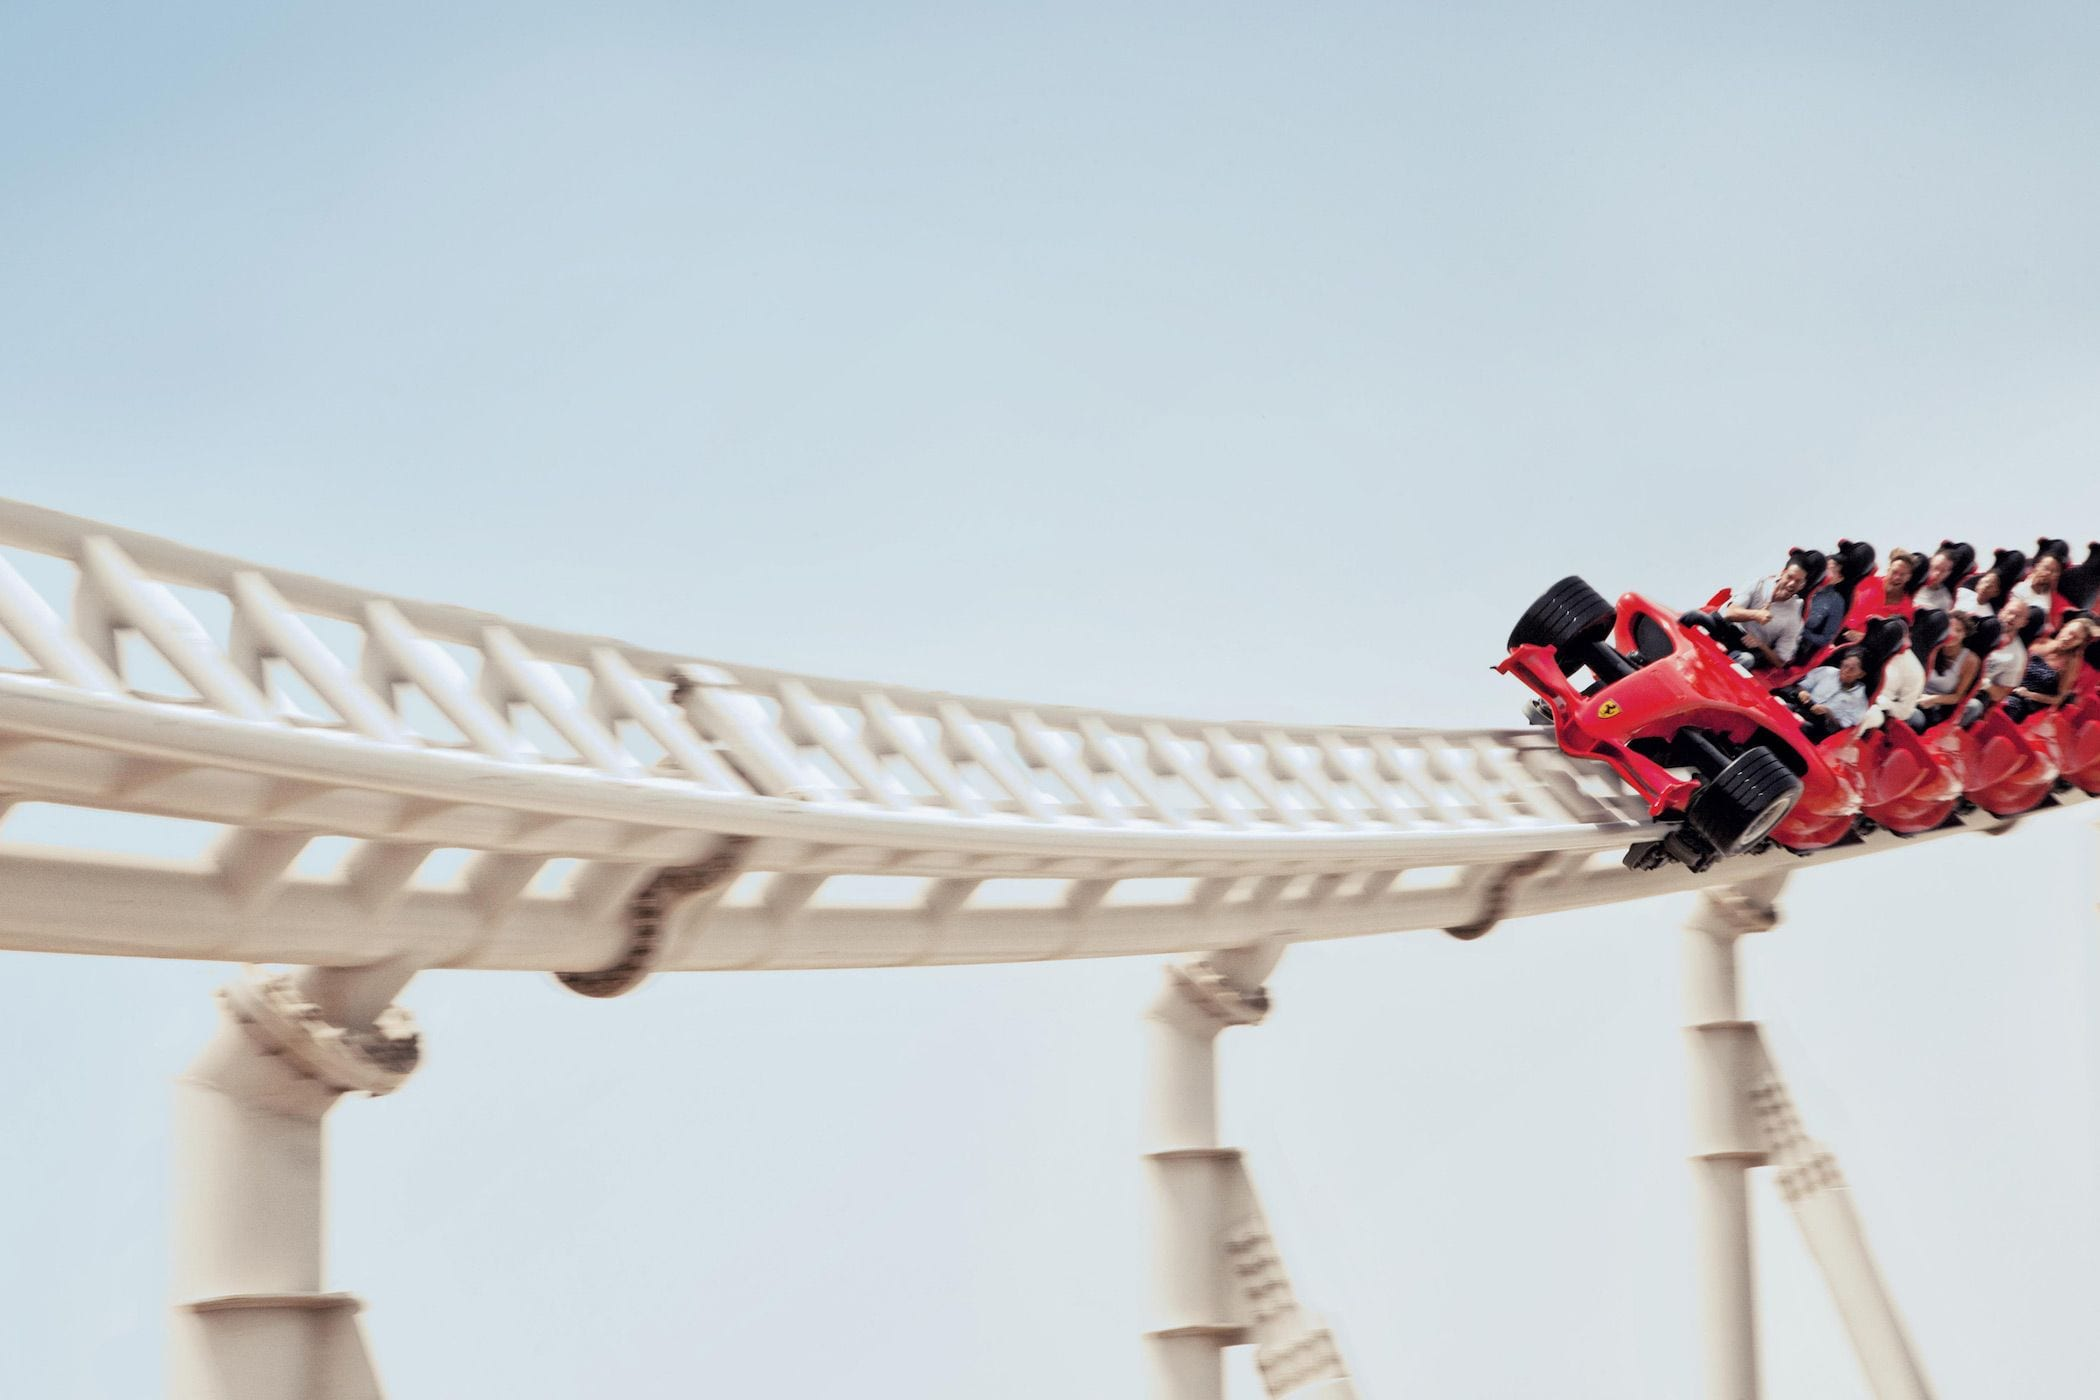 ferrari world abu dhabi formula rossa roller coaster jesse vargas